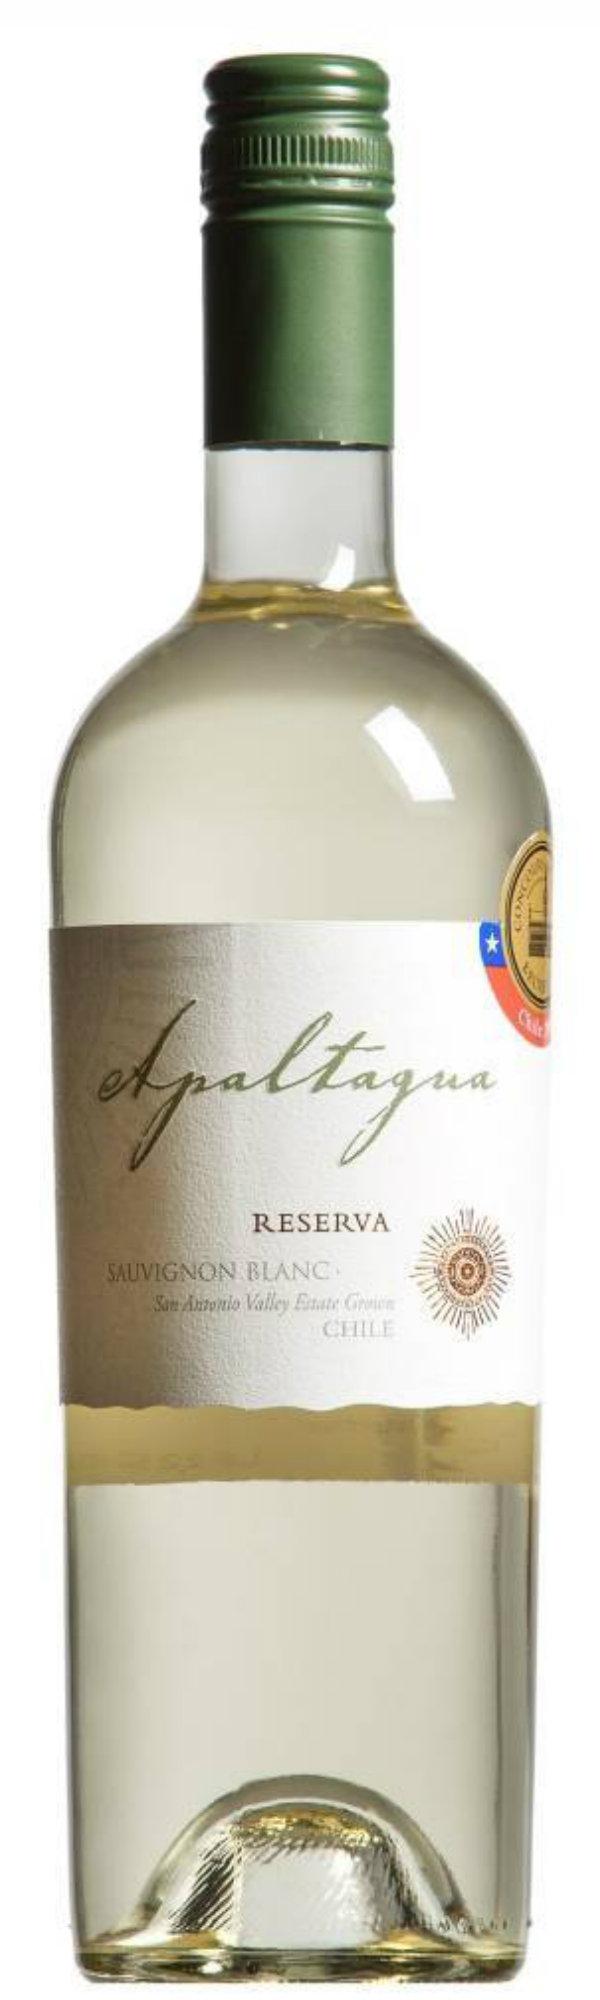 Viña Apaltagua Sauvignon Blanc Reserva